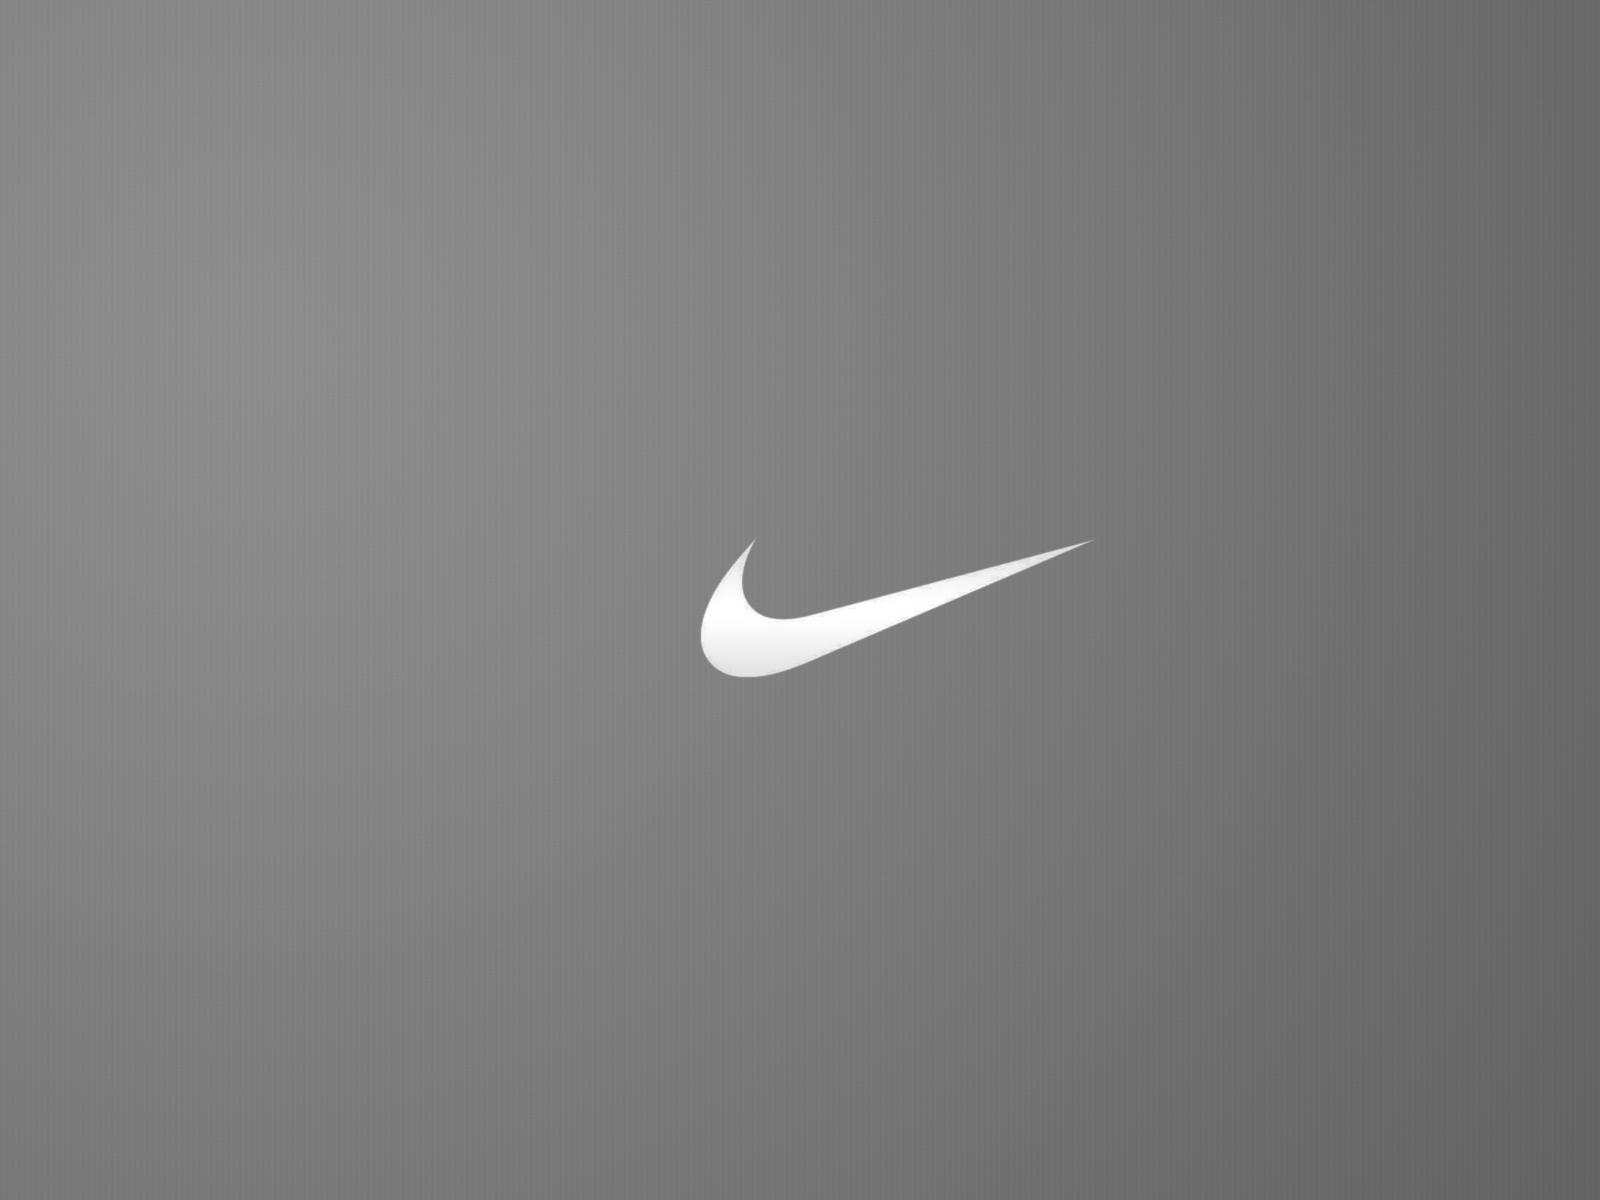 Nike Brand Logo Minimal HD Wallpapers Download Wallpapers in HD 1600x1200